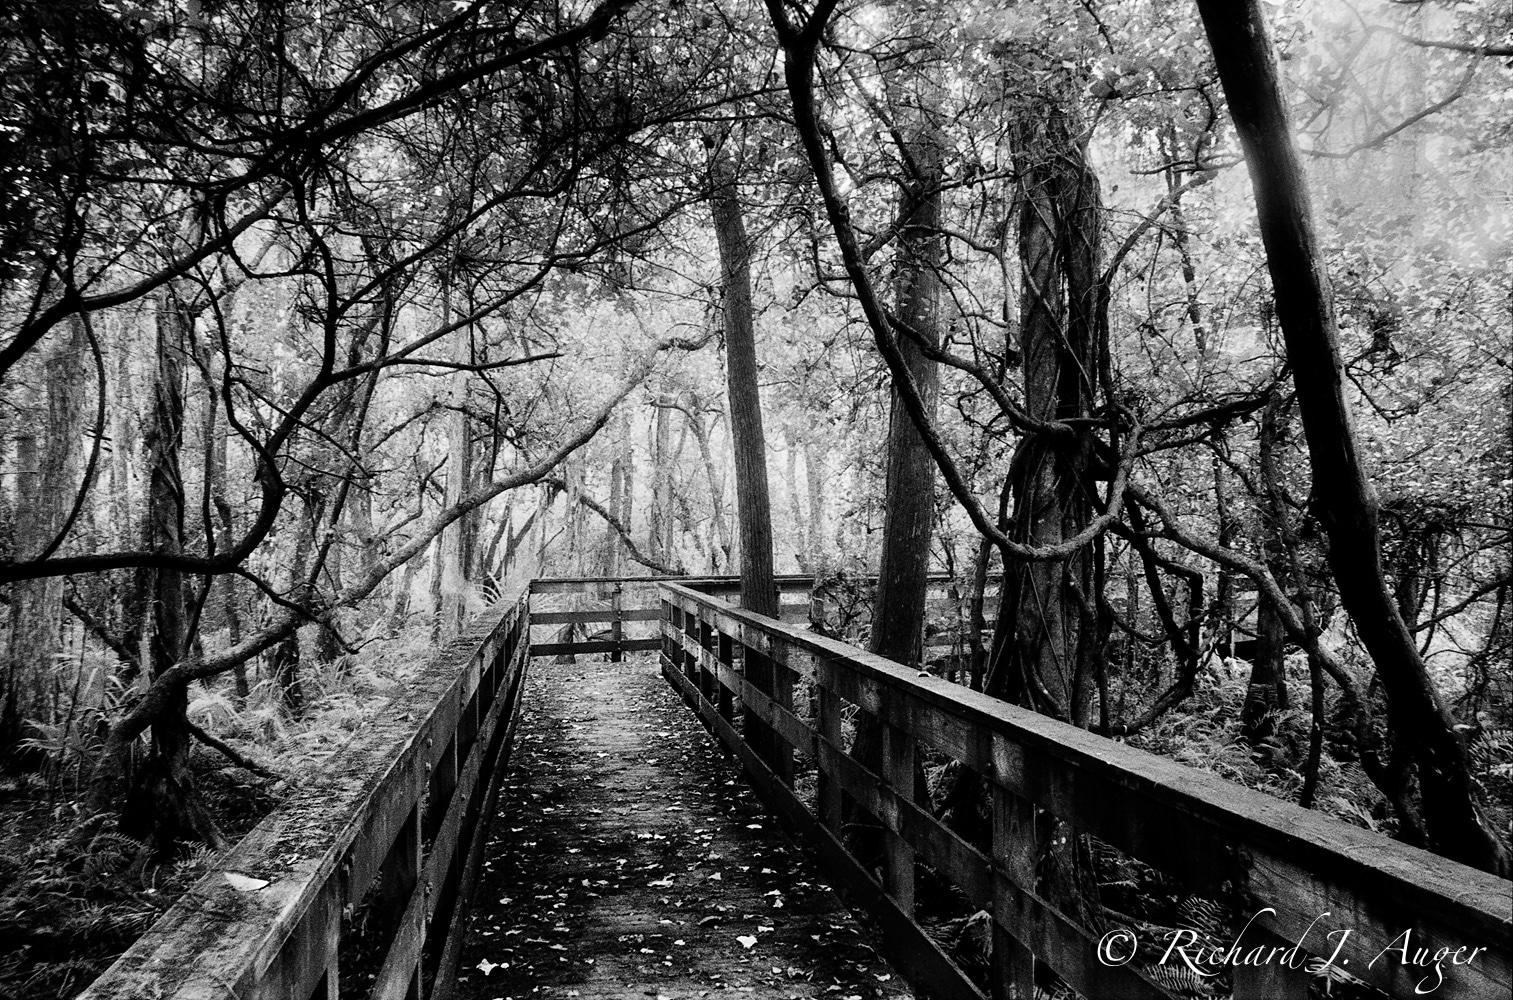 Everglades, Florida, Swamp, Boardwalk, Black and White, Celestia Series